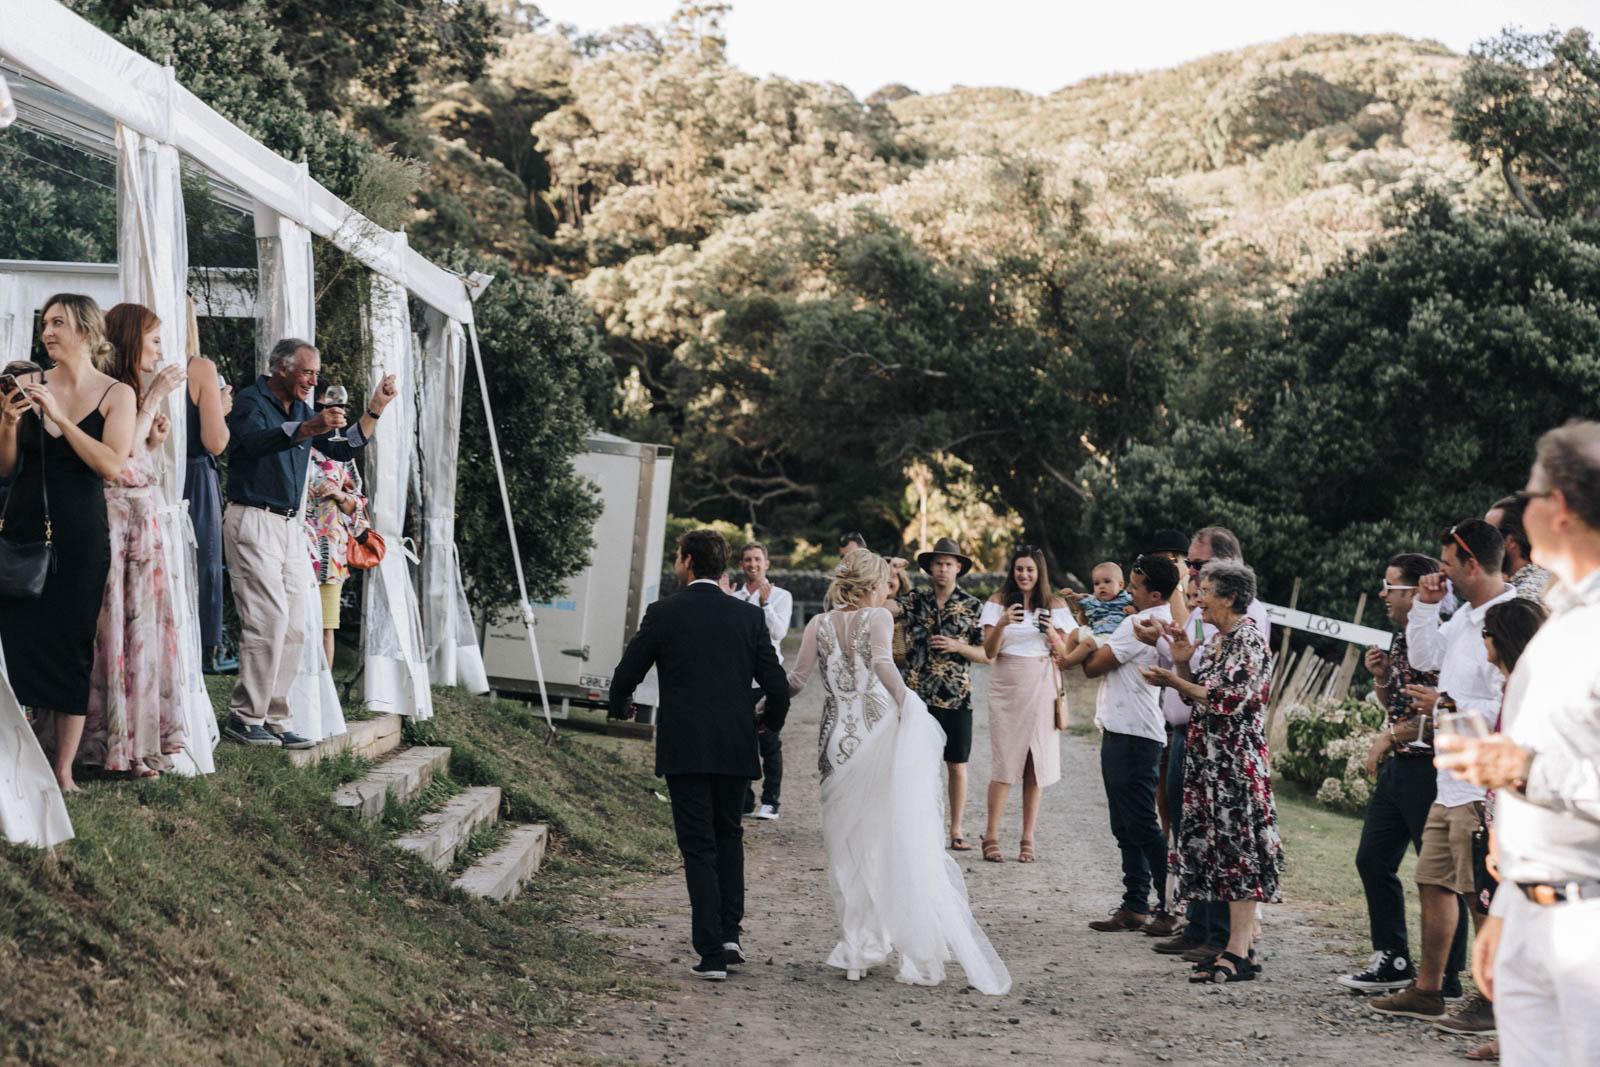 newfound-l-i-coromandel-wedding-photographer-1825-A9_04665